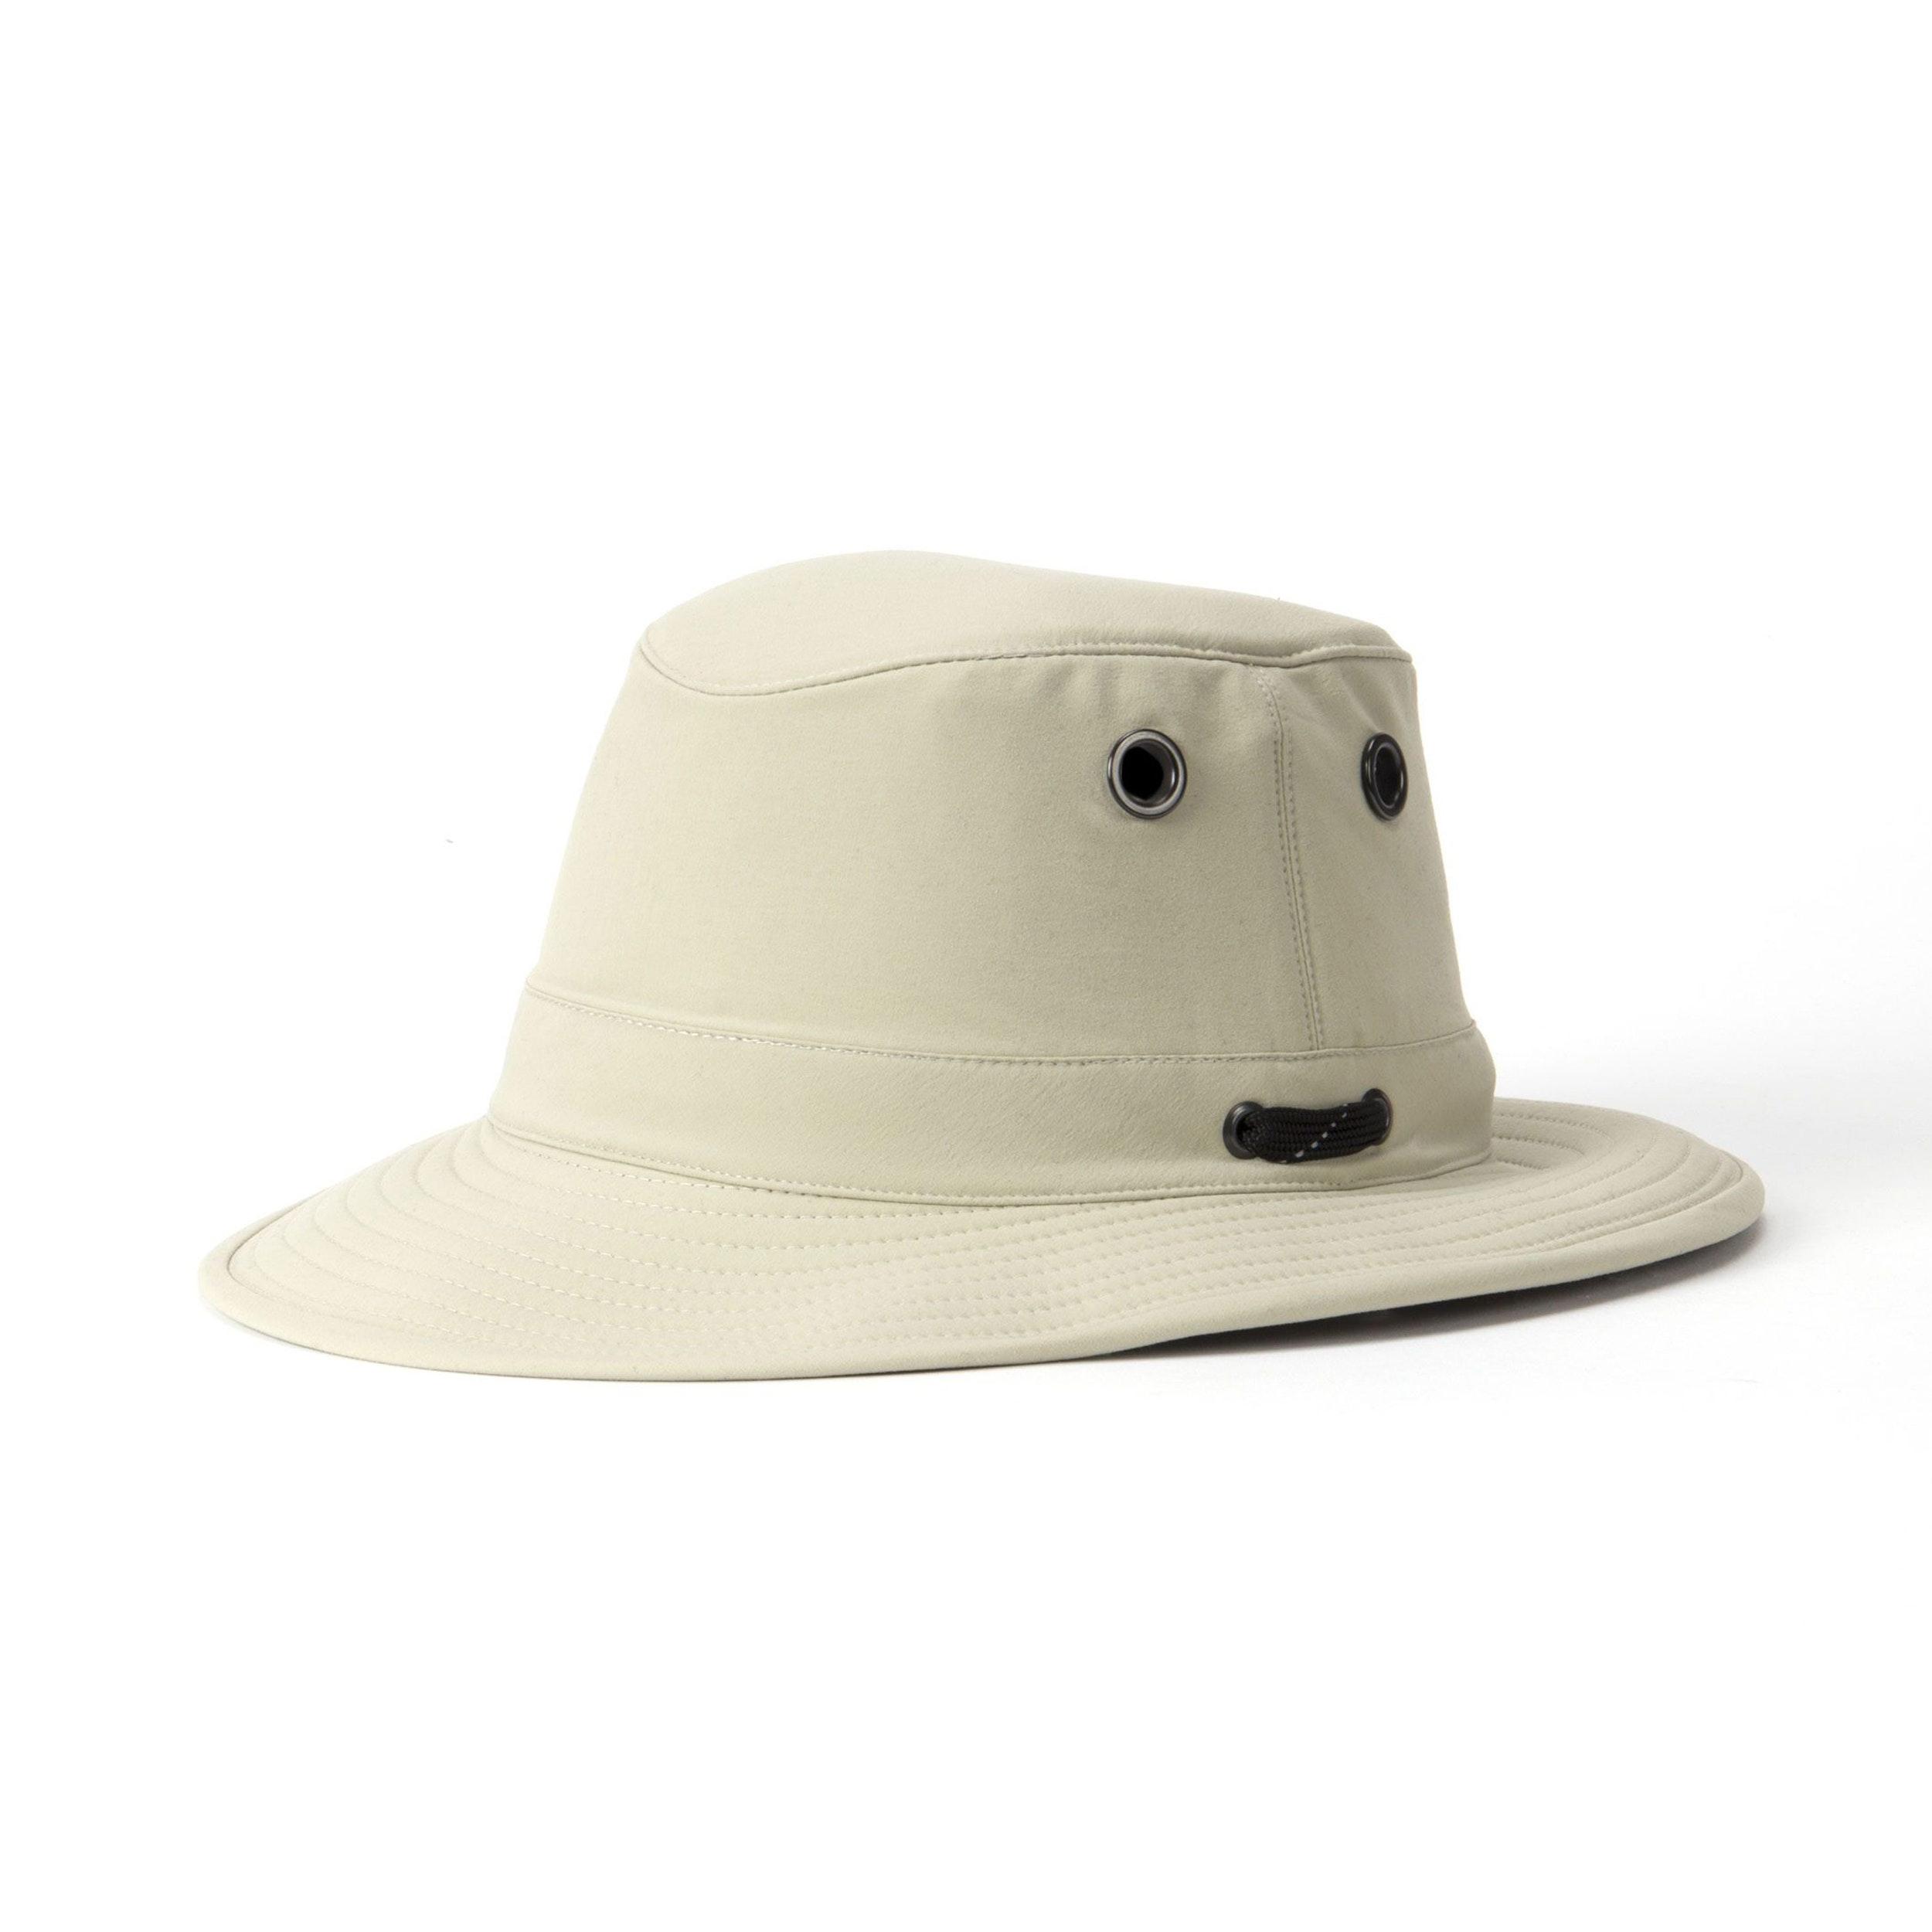 9d83d64f9b48d Tilley Medium Brim Breathable Nylon Hat - Lightweight